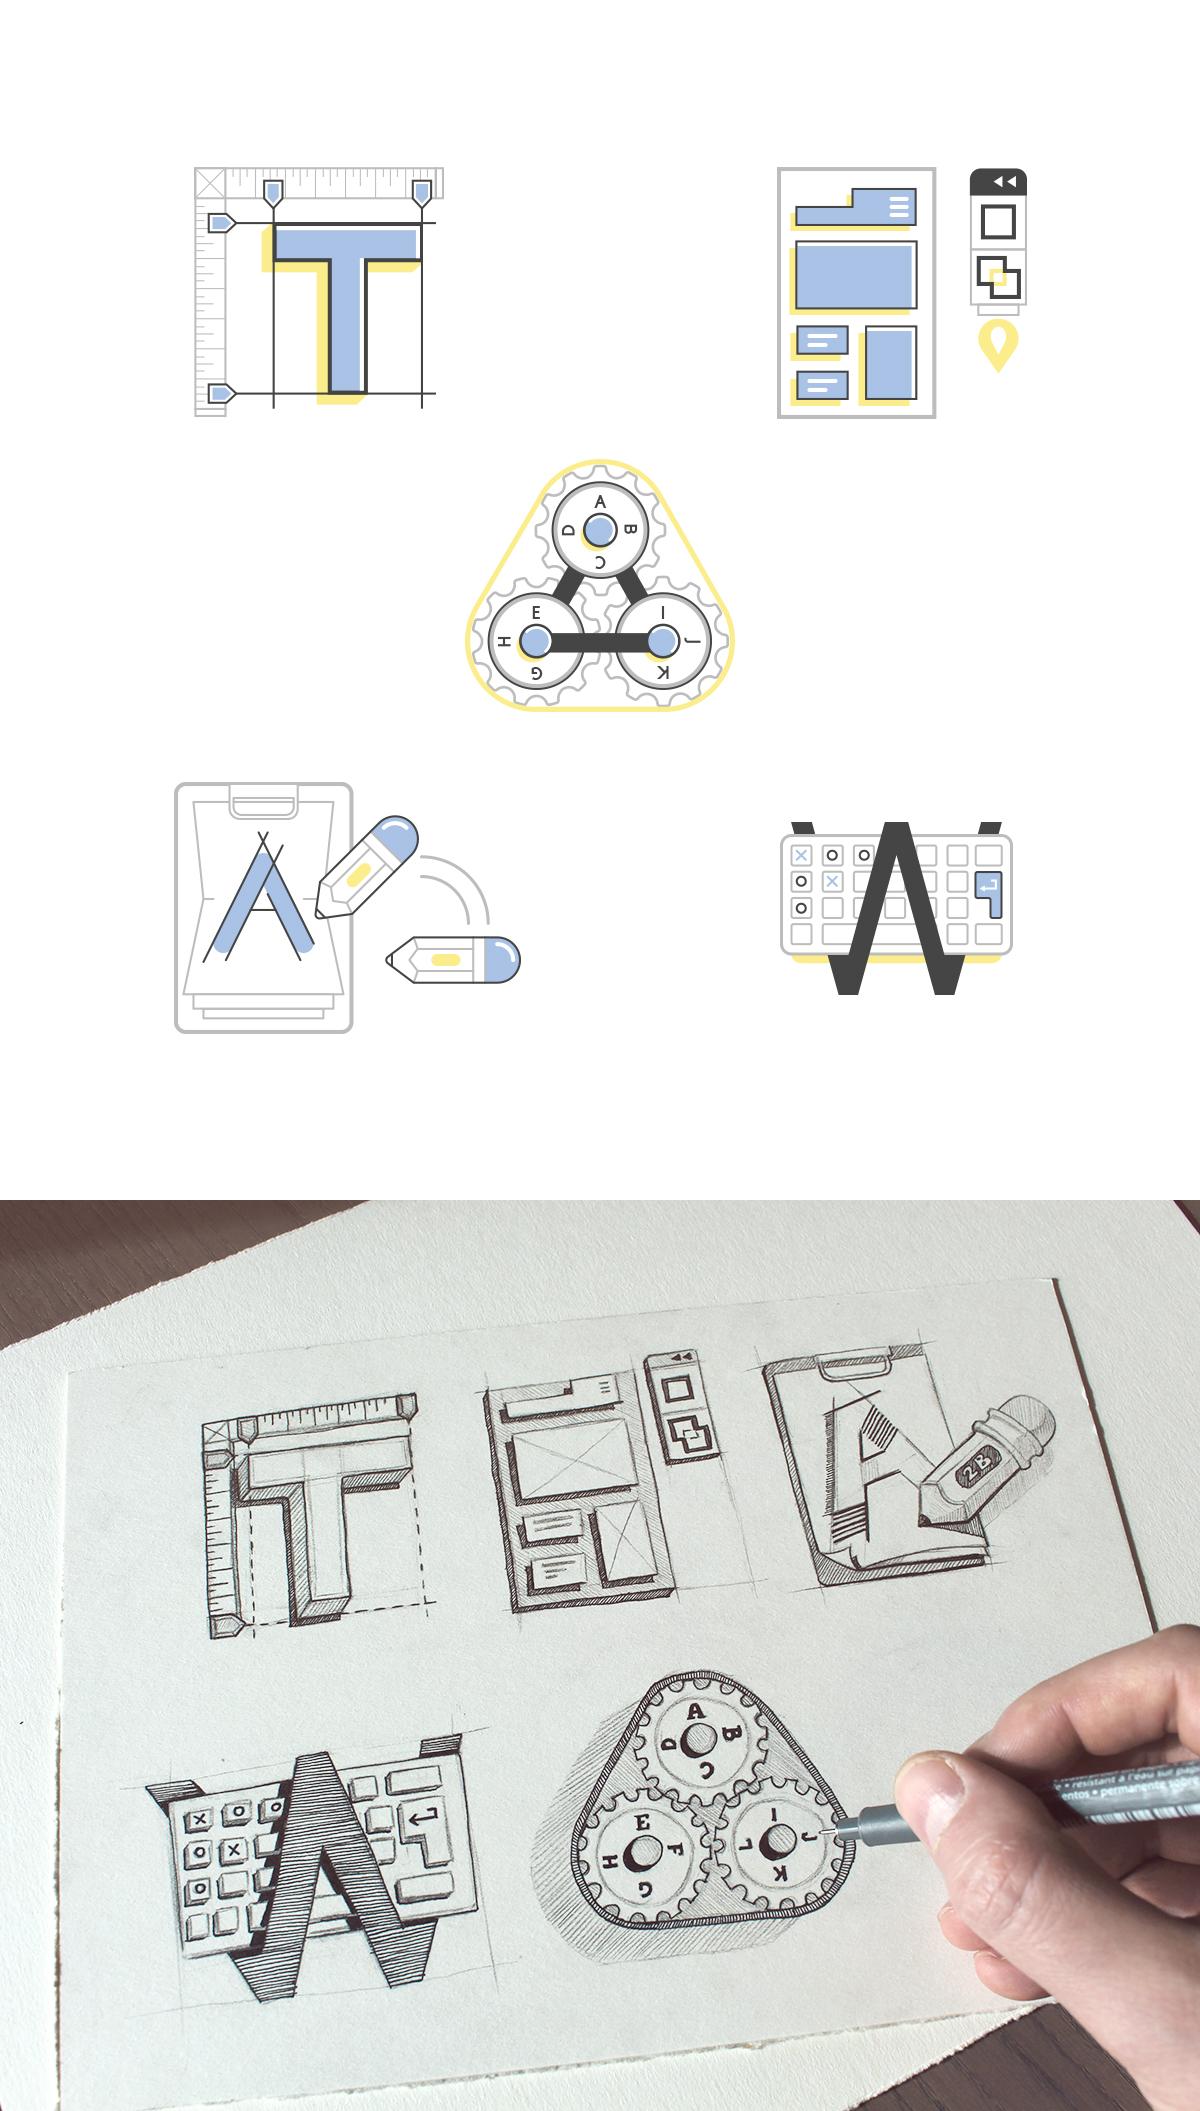 Process icons large